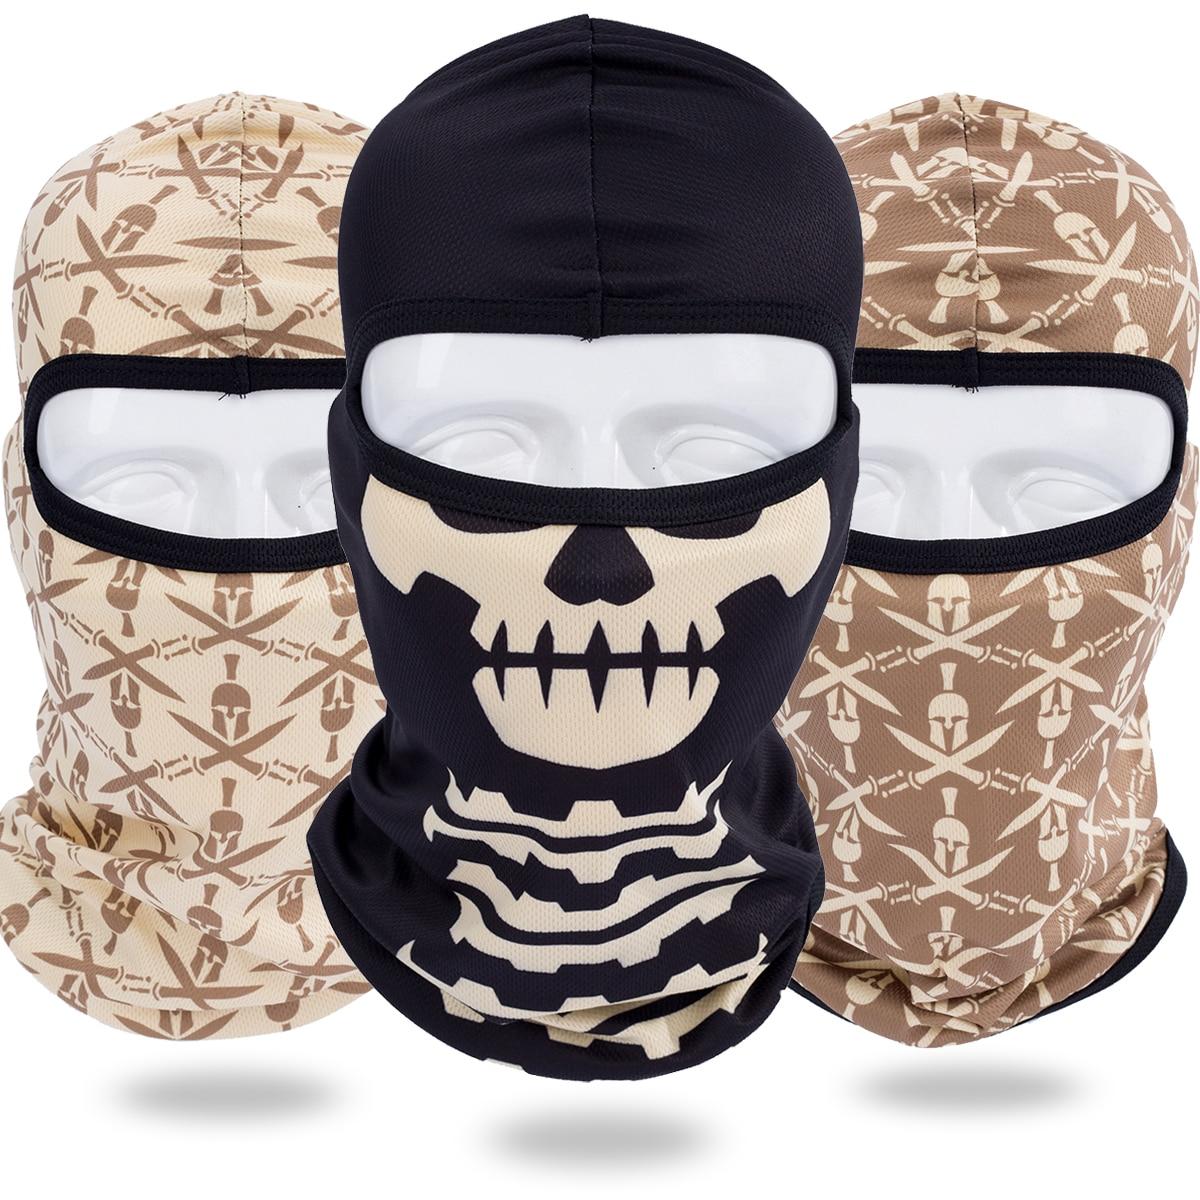 Balaclava Ghost Face Mask Promotion-Shop for Promotional Balaclava ...